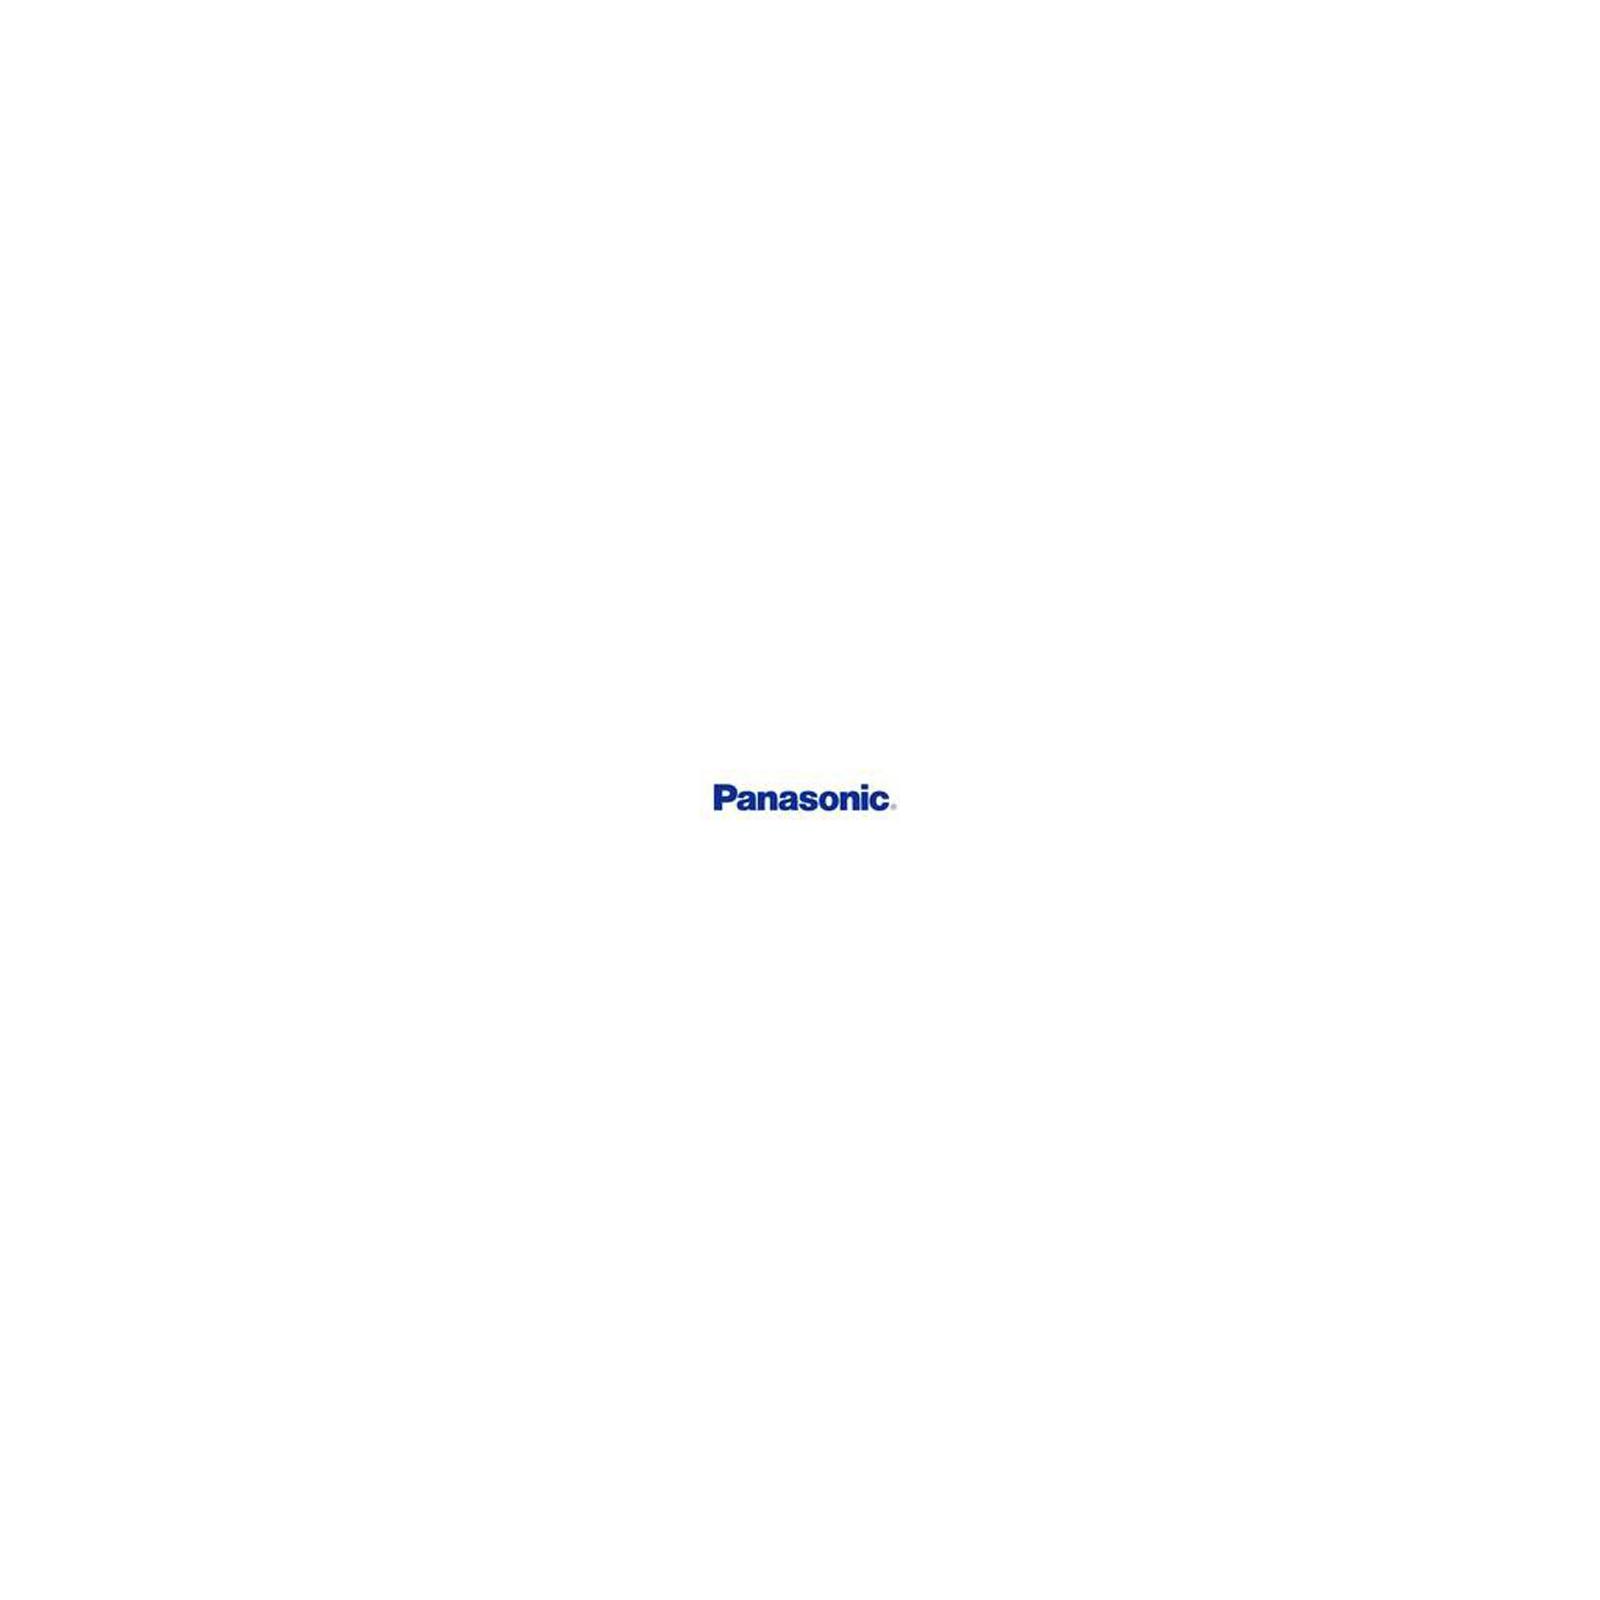 Программная продукция KX-A291X PMS PANASONIC (KX-A291X)